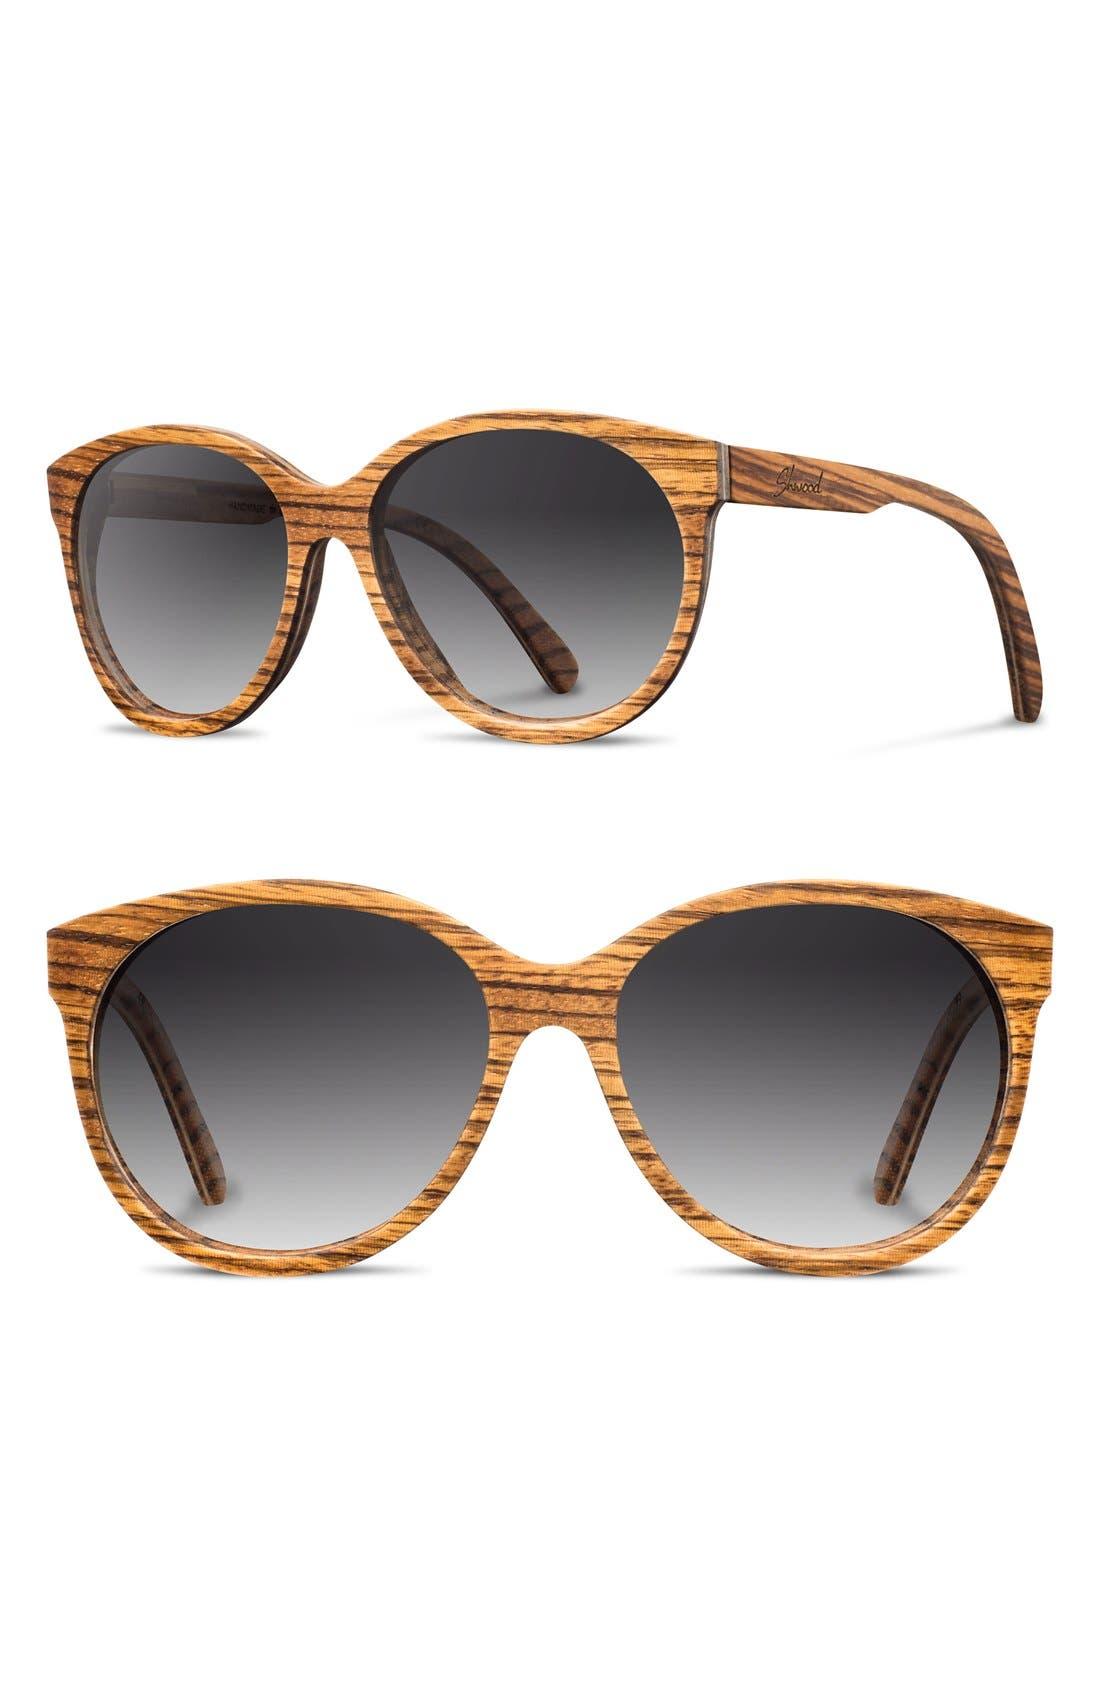 'Madison' 54mm Polarized Round Wood Sunglasses,                         Main,                         color, 219